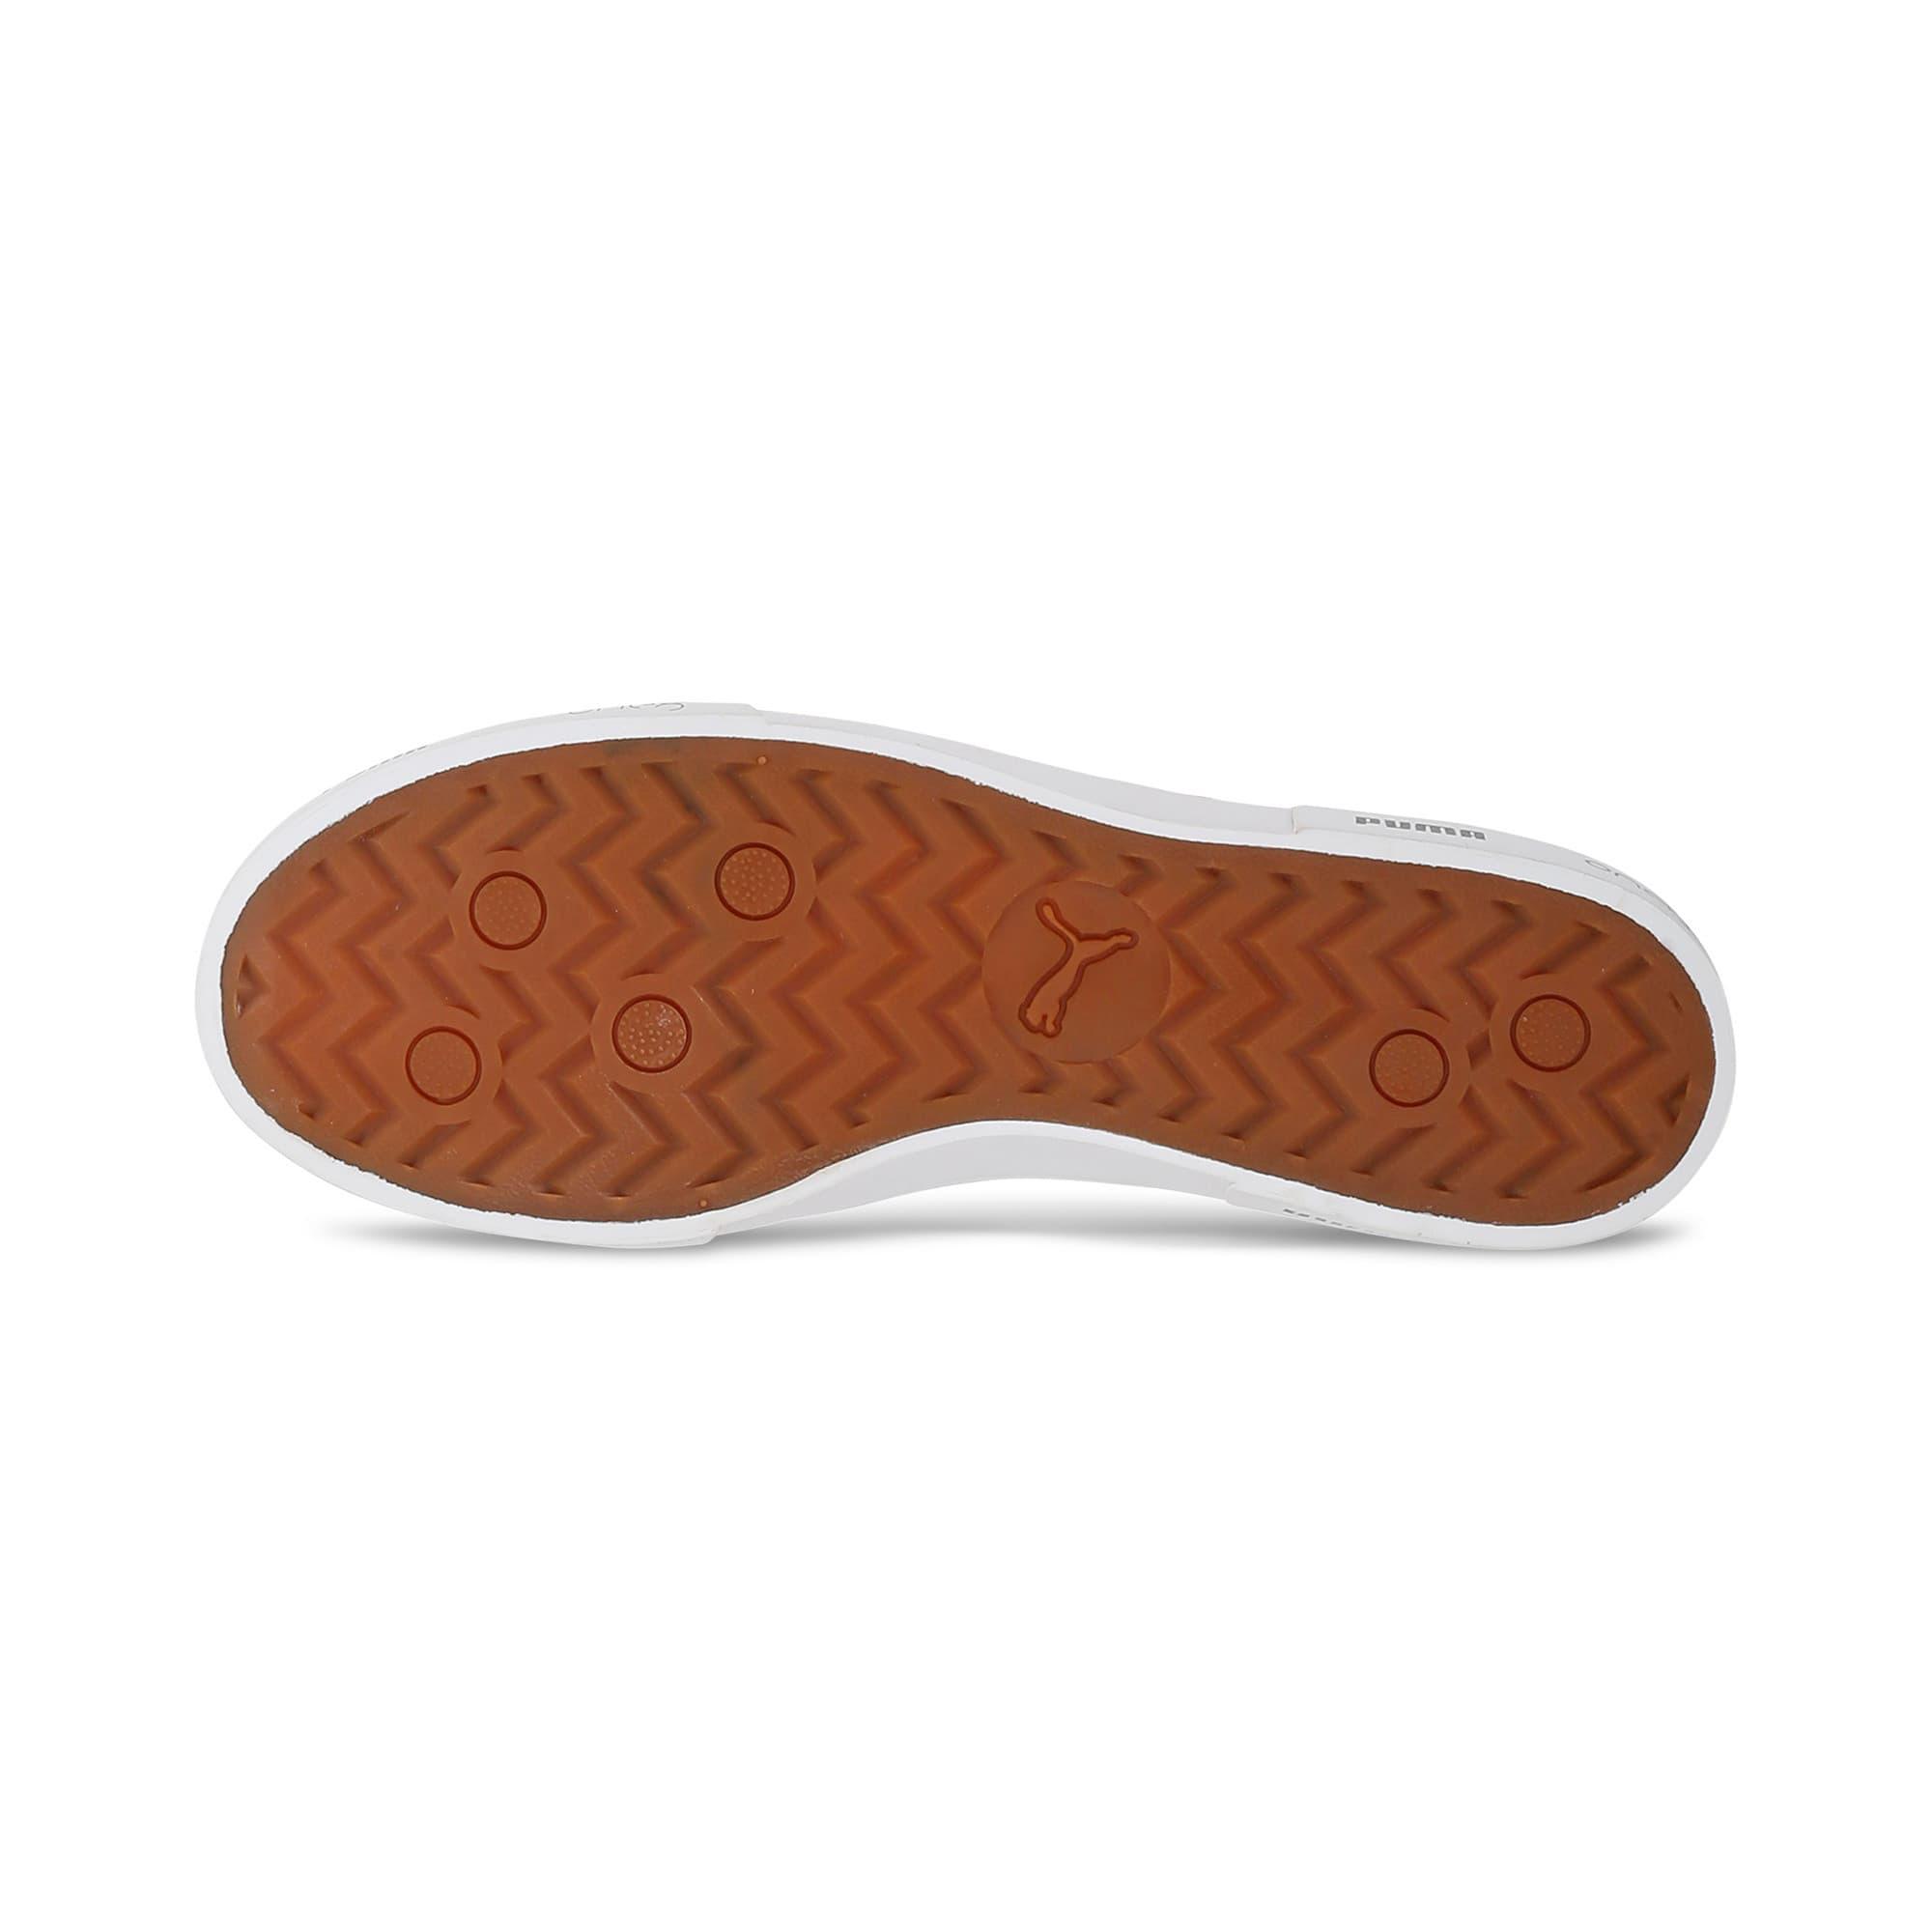 Thumbnail 4 of one8 V2 IDP Men's Sneakers, Iron Gate-Puma White, medium-IND